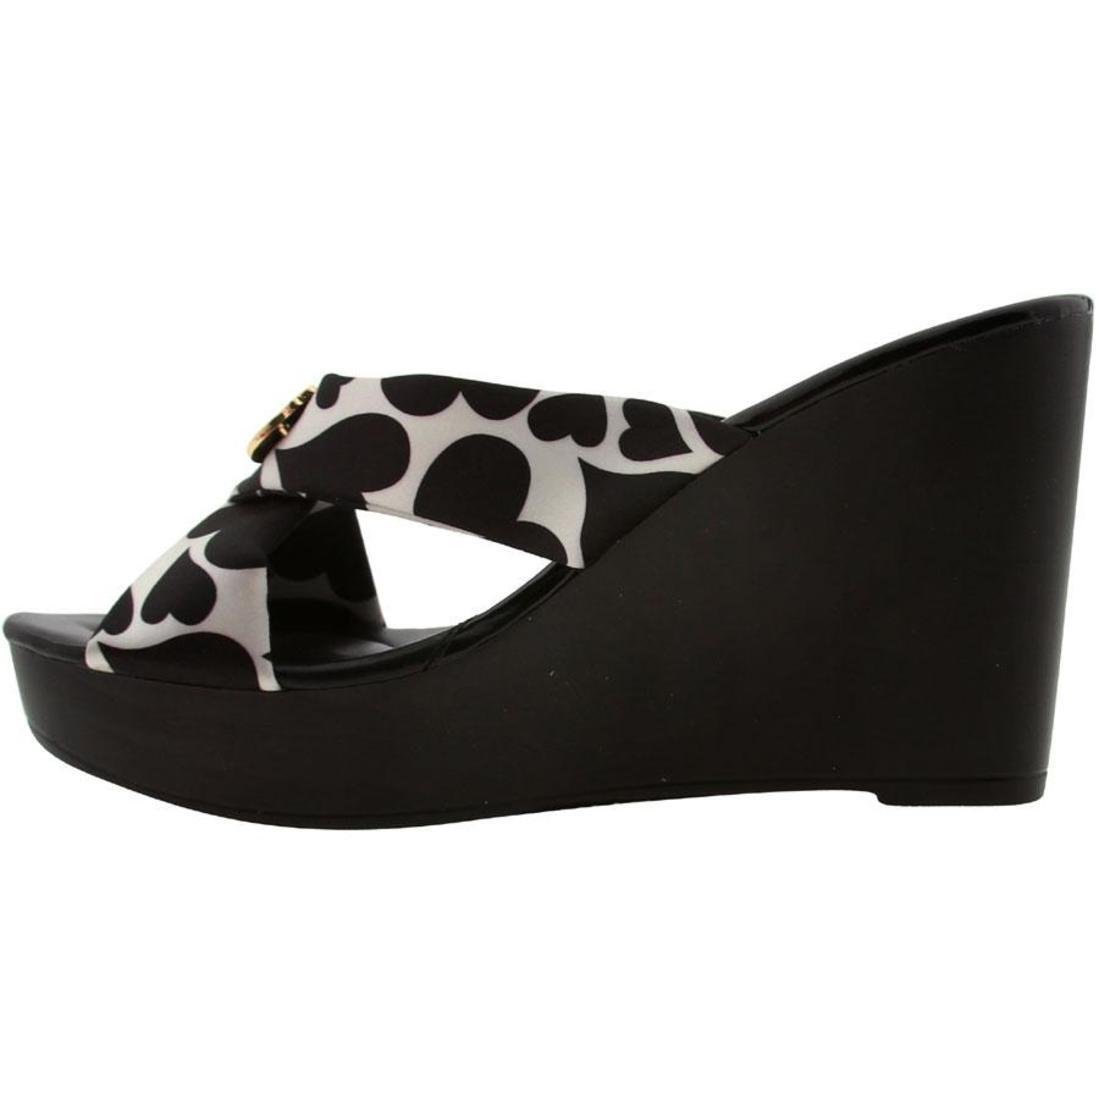 $71.99 Hello Kitty Damenschuhe Felice Heels Schuhes (schwarz print) MW1D03-BPT